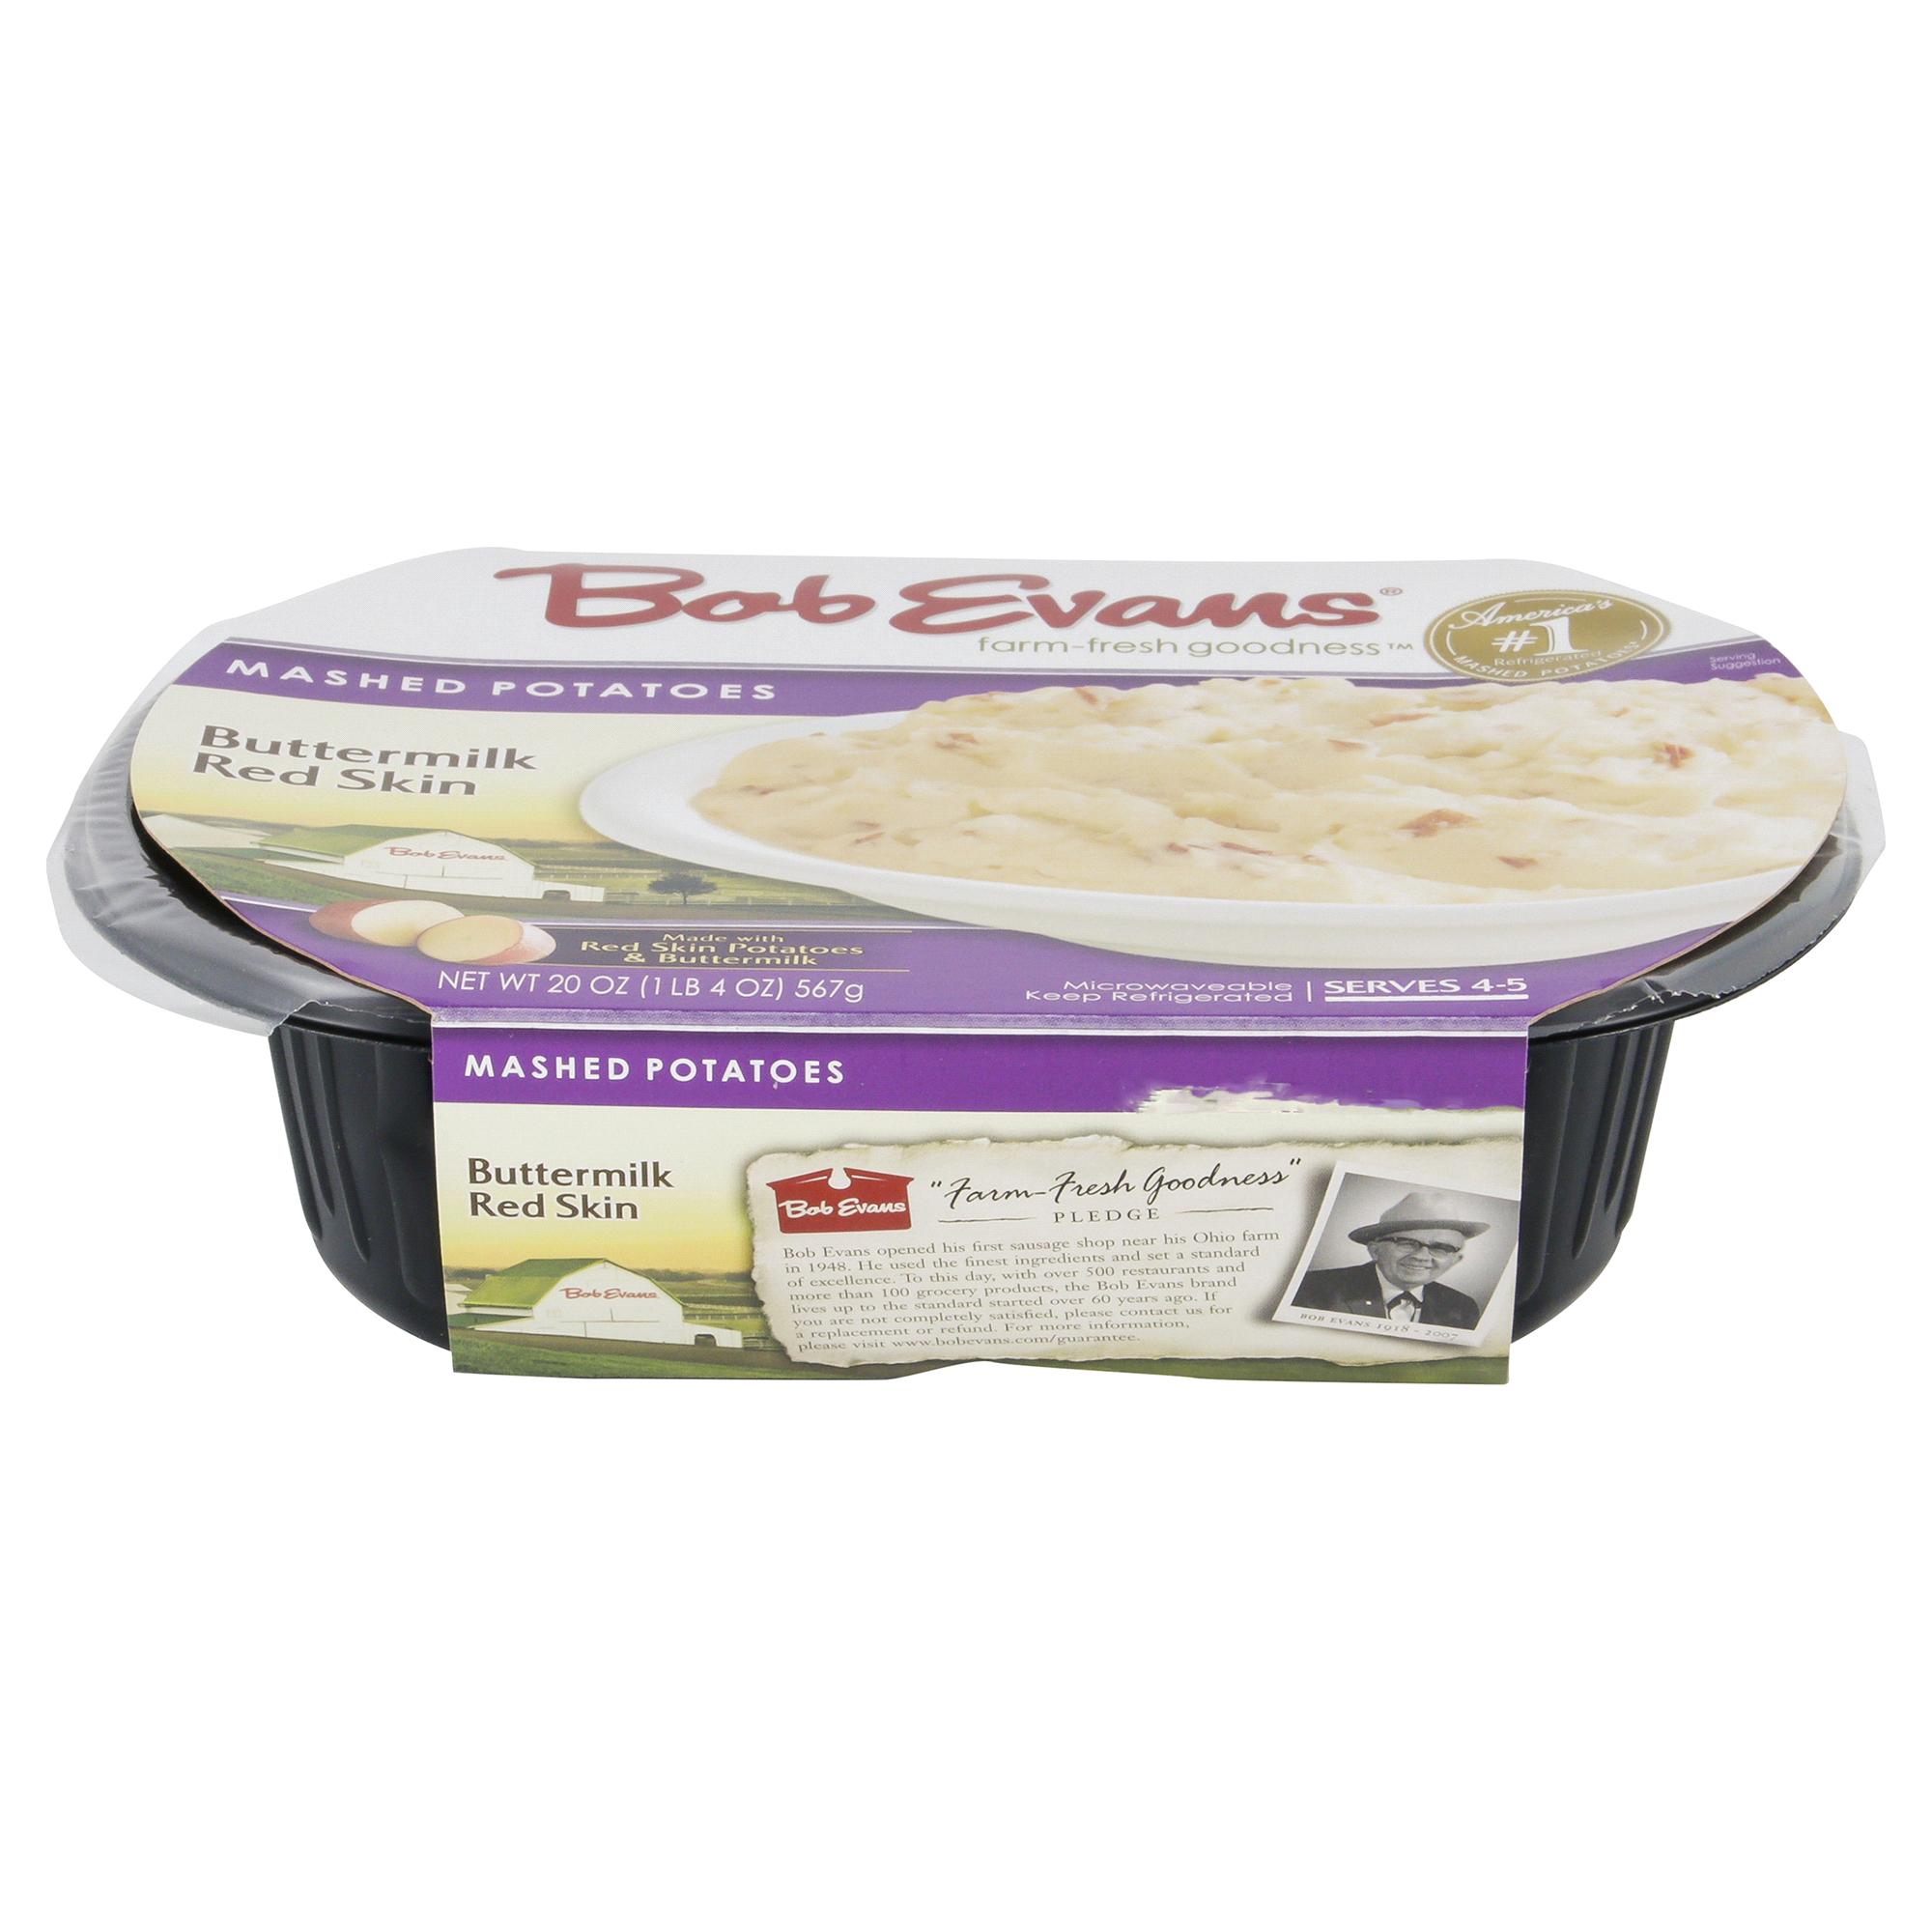 Bob Evans Mashed Potatoes Buttermilk Red Skin 20 Oz Meijer